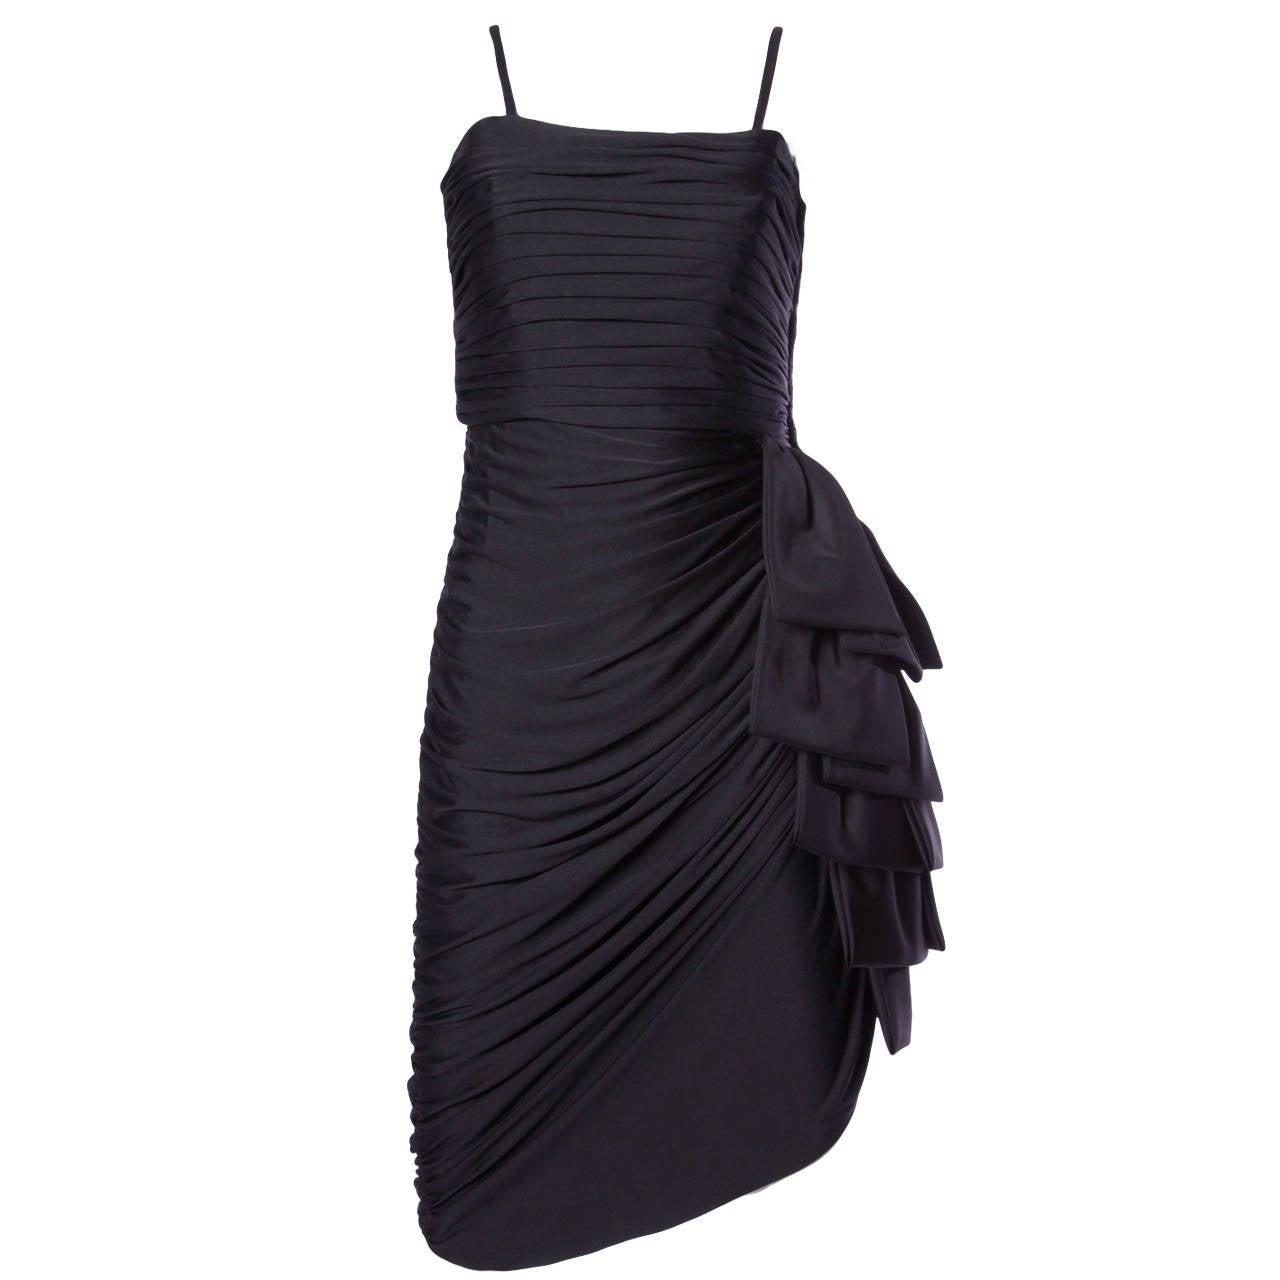 Lilli Diamond Vintage 1970s 70s Black Asymmetric Ruched Cocktail Dress For Sale